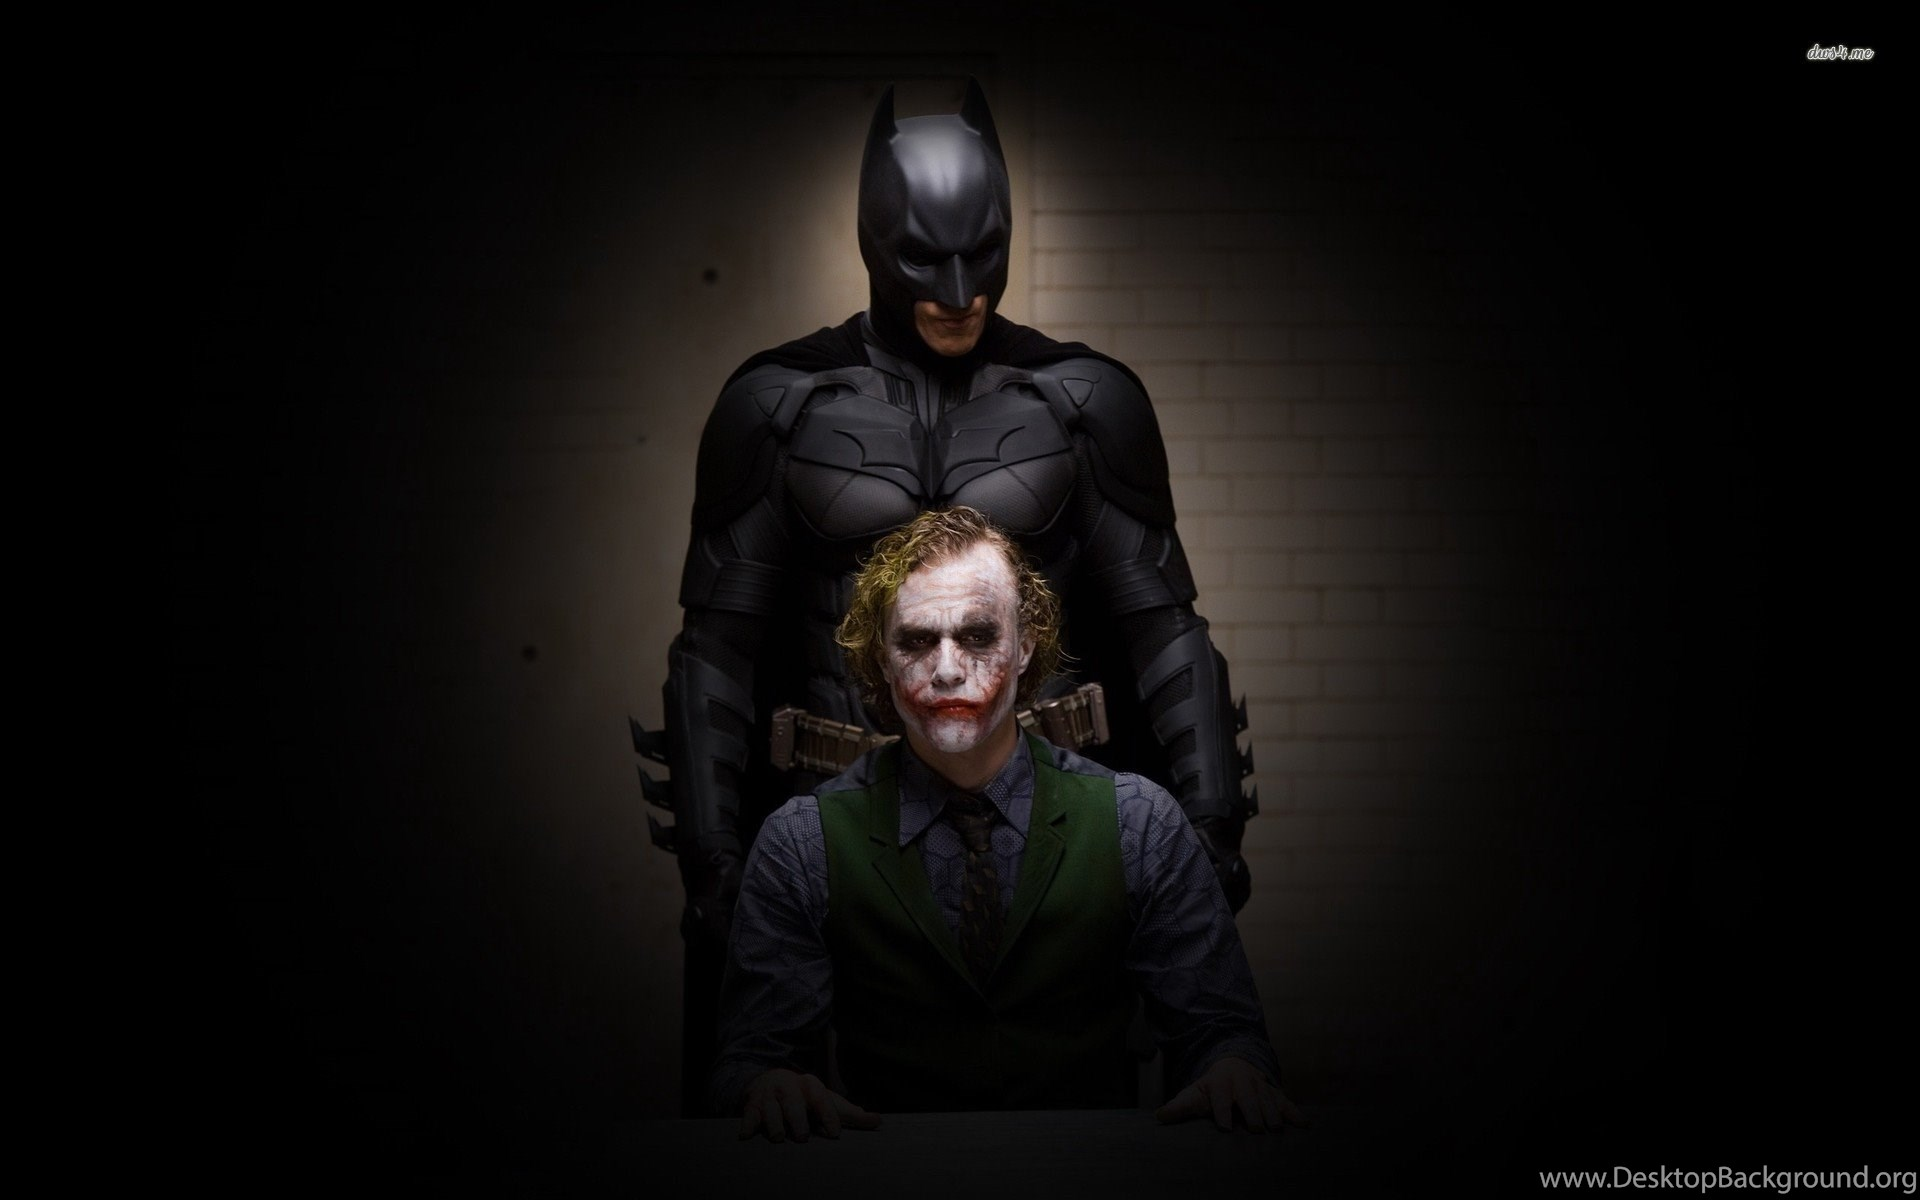 Batman And The Joker Christian Bale Heath Ledger The Dark